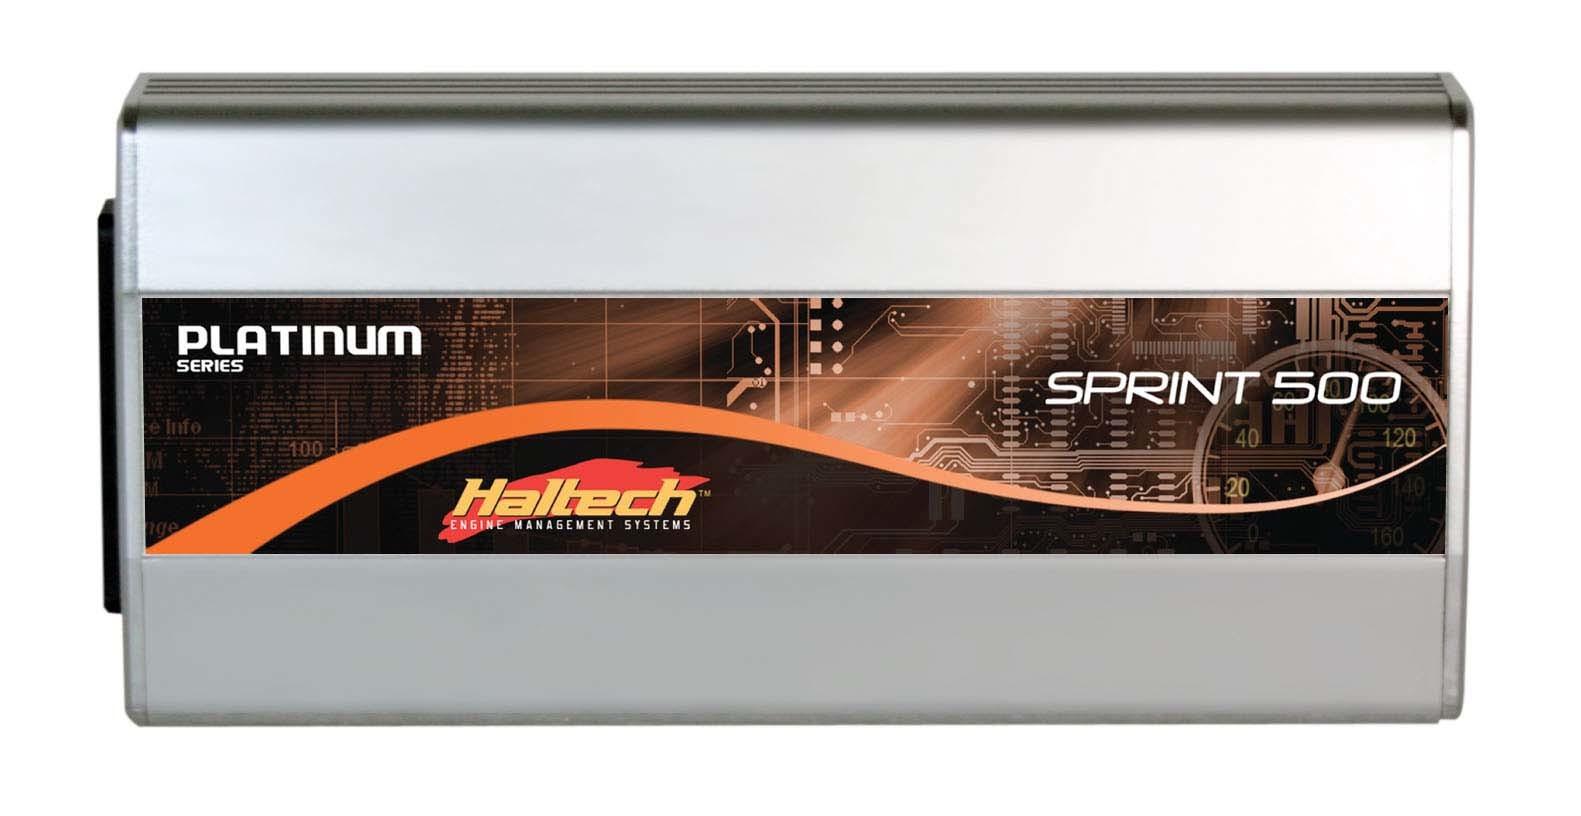 ЭБУ Haltech Platinum Sprint 500